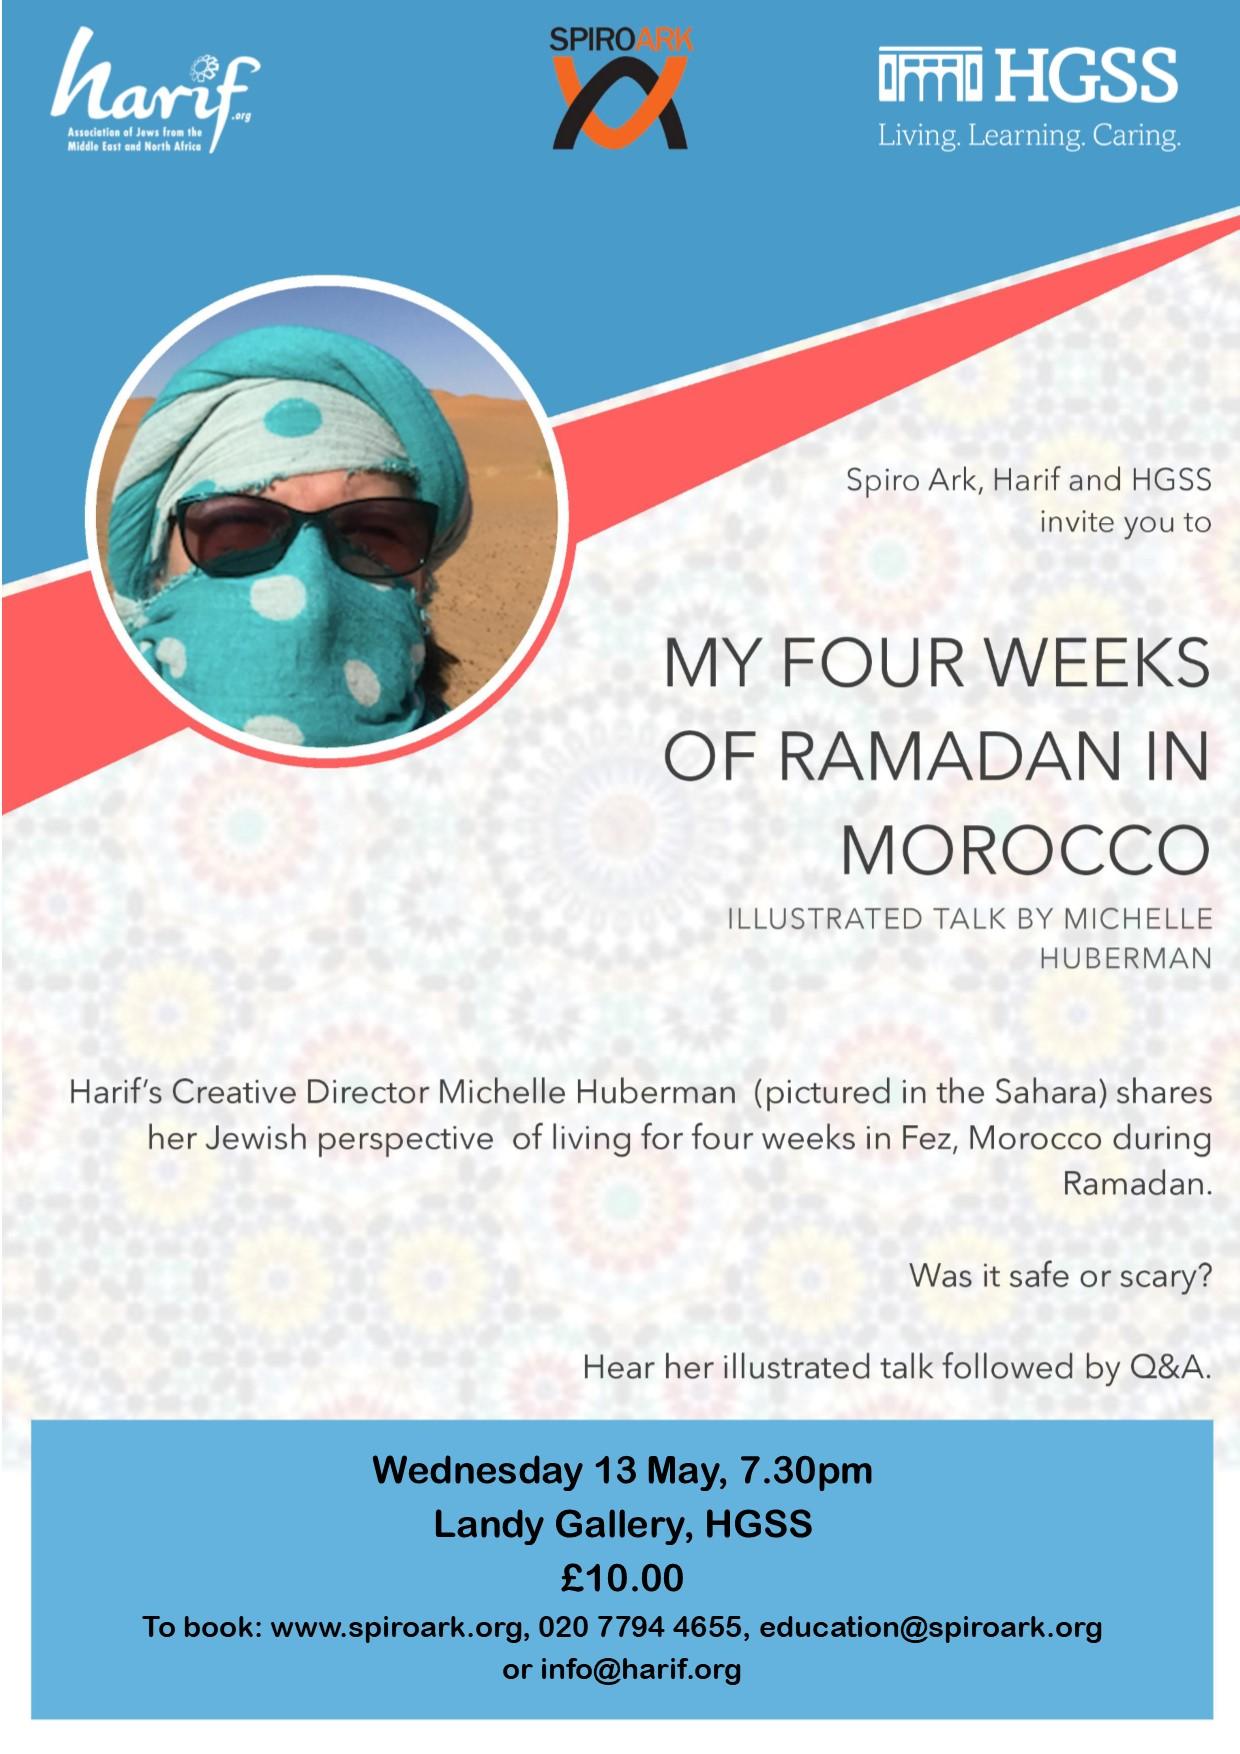 Spiro Ark - My four weeks of ramadan in Morocco @ The Landy Gallery